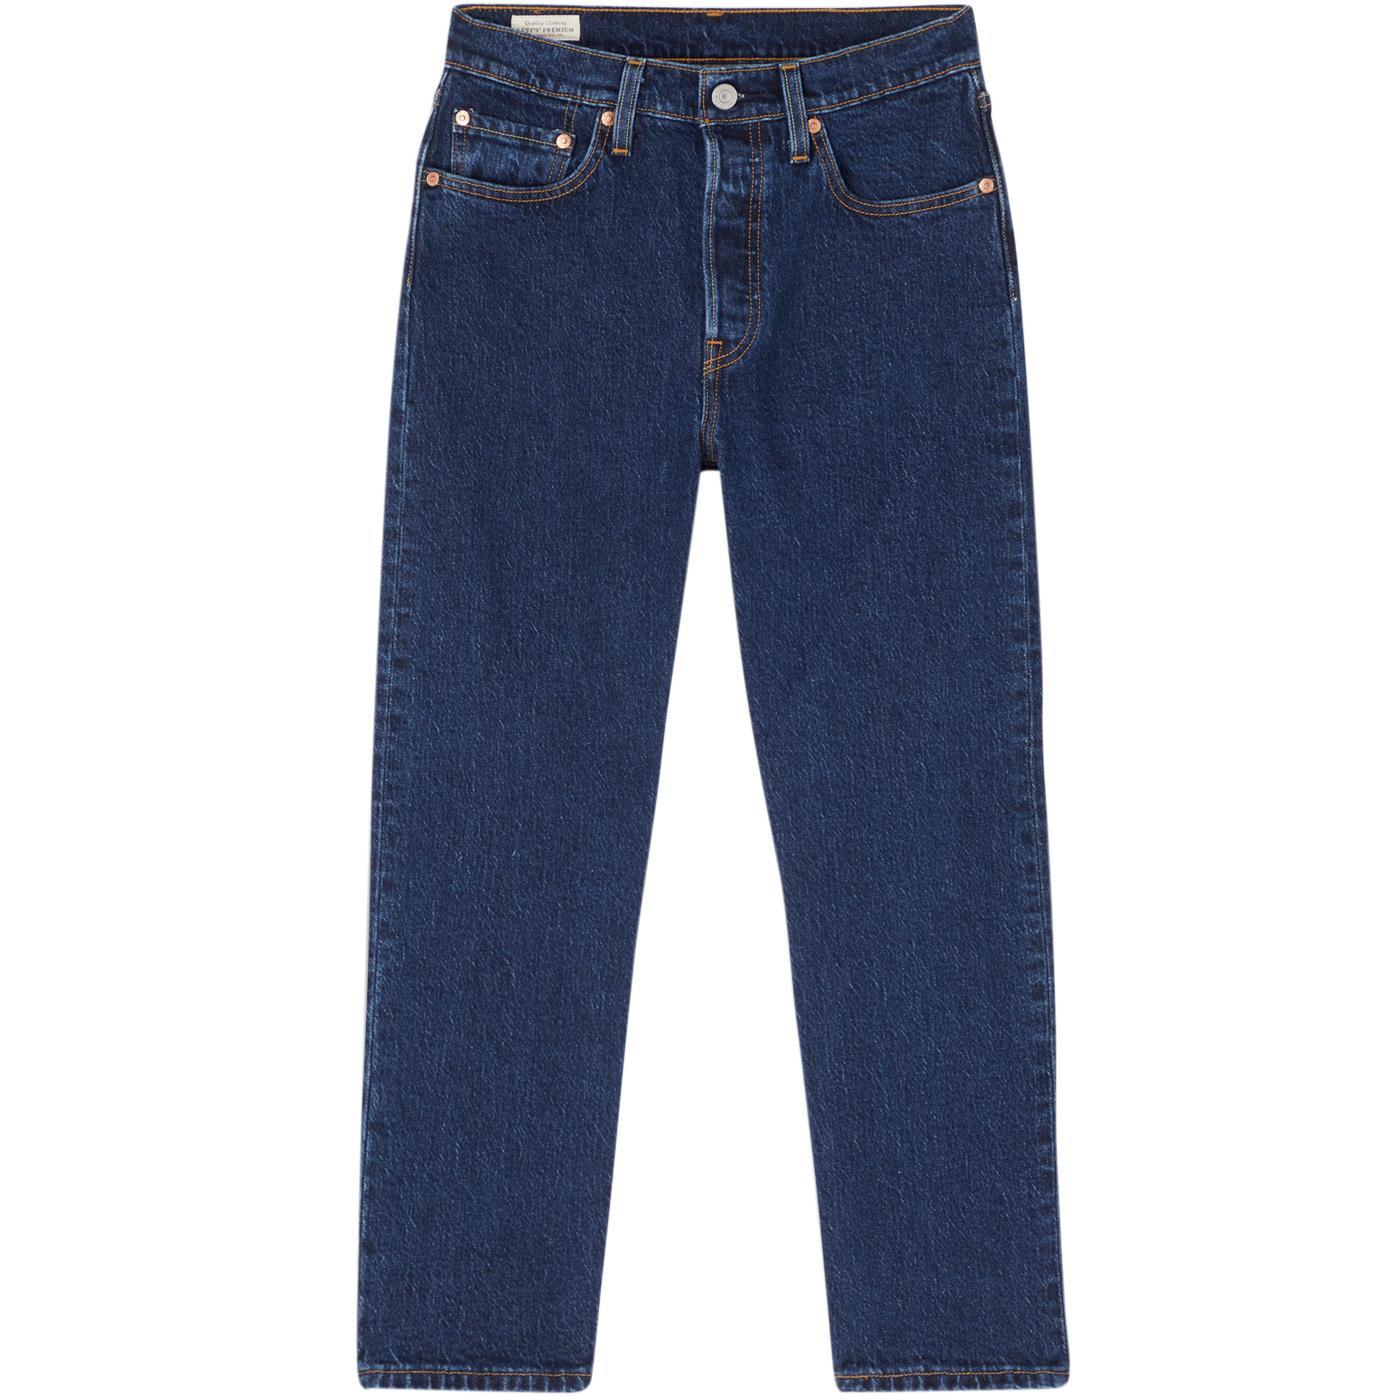 LEVI'S 501 Cropped Retro Jeans (Salsa Stonewash)